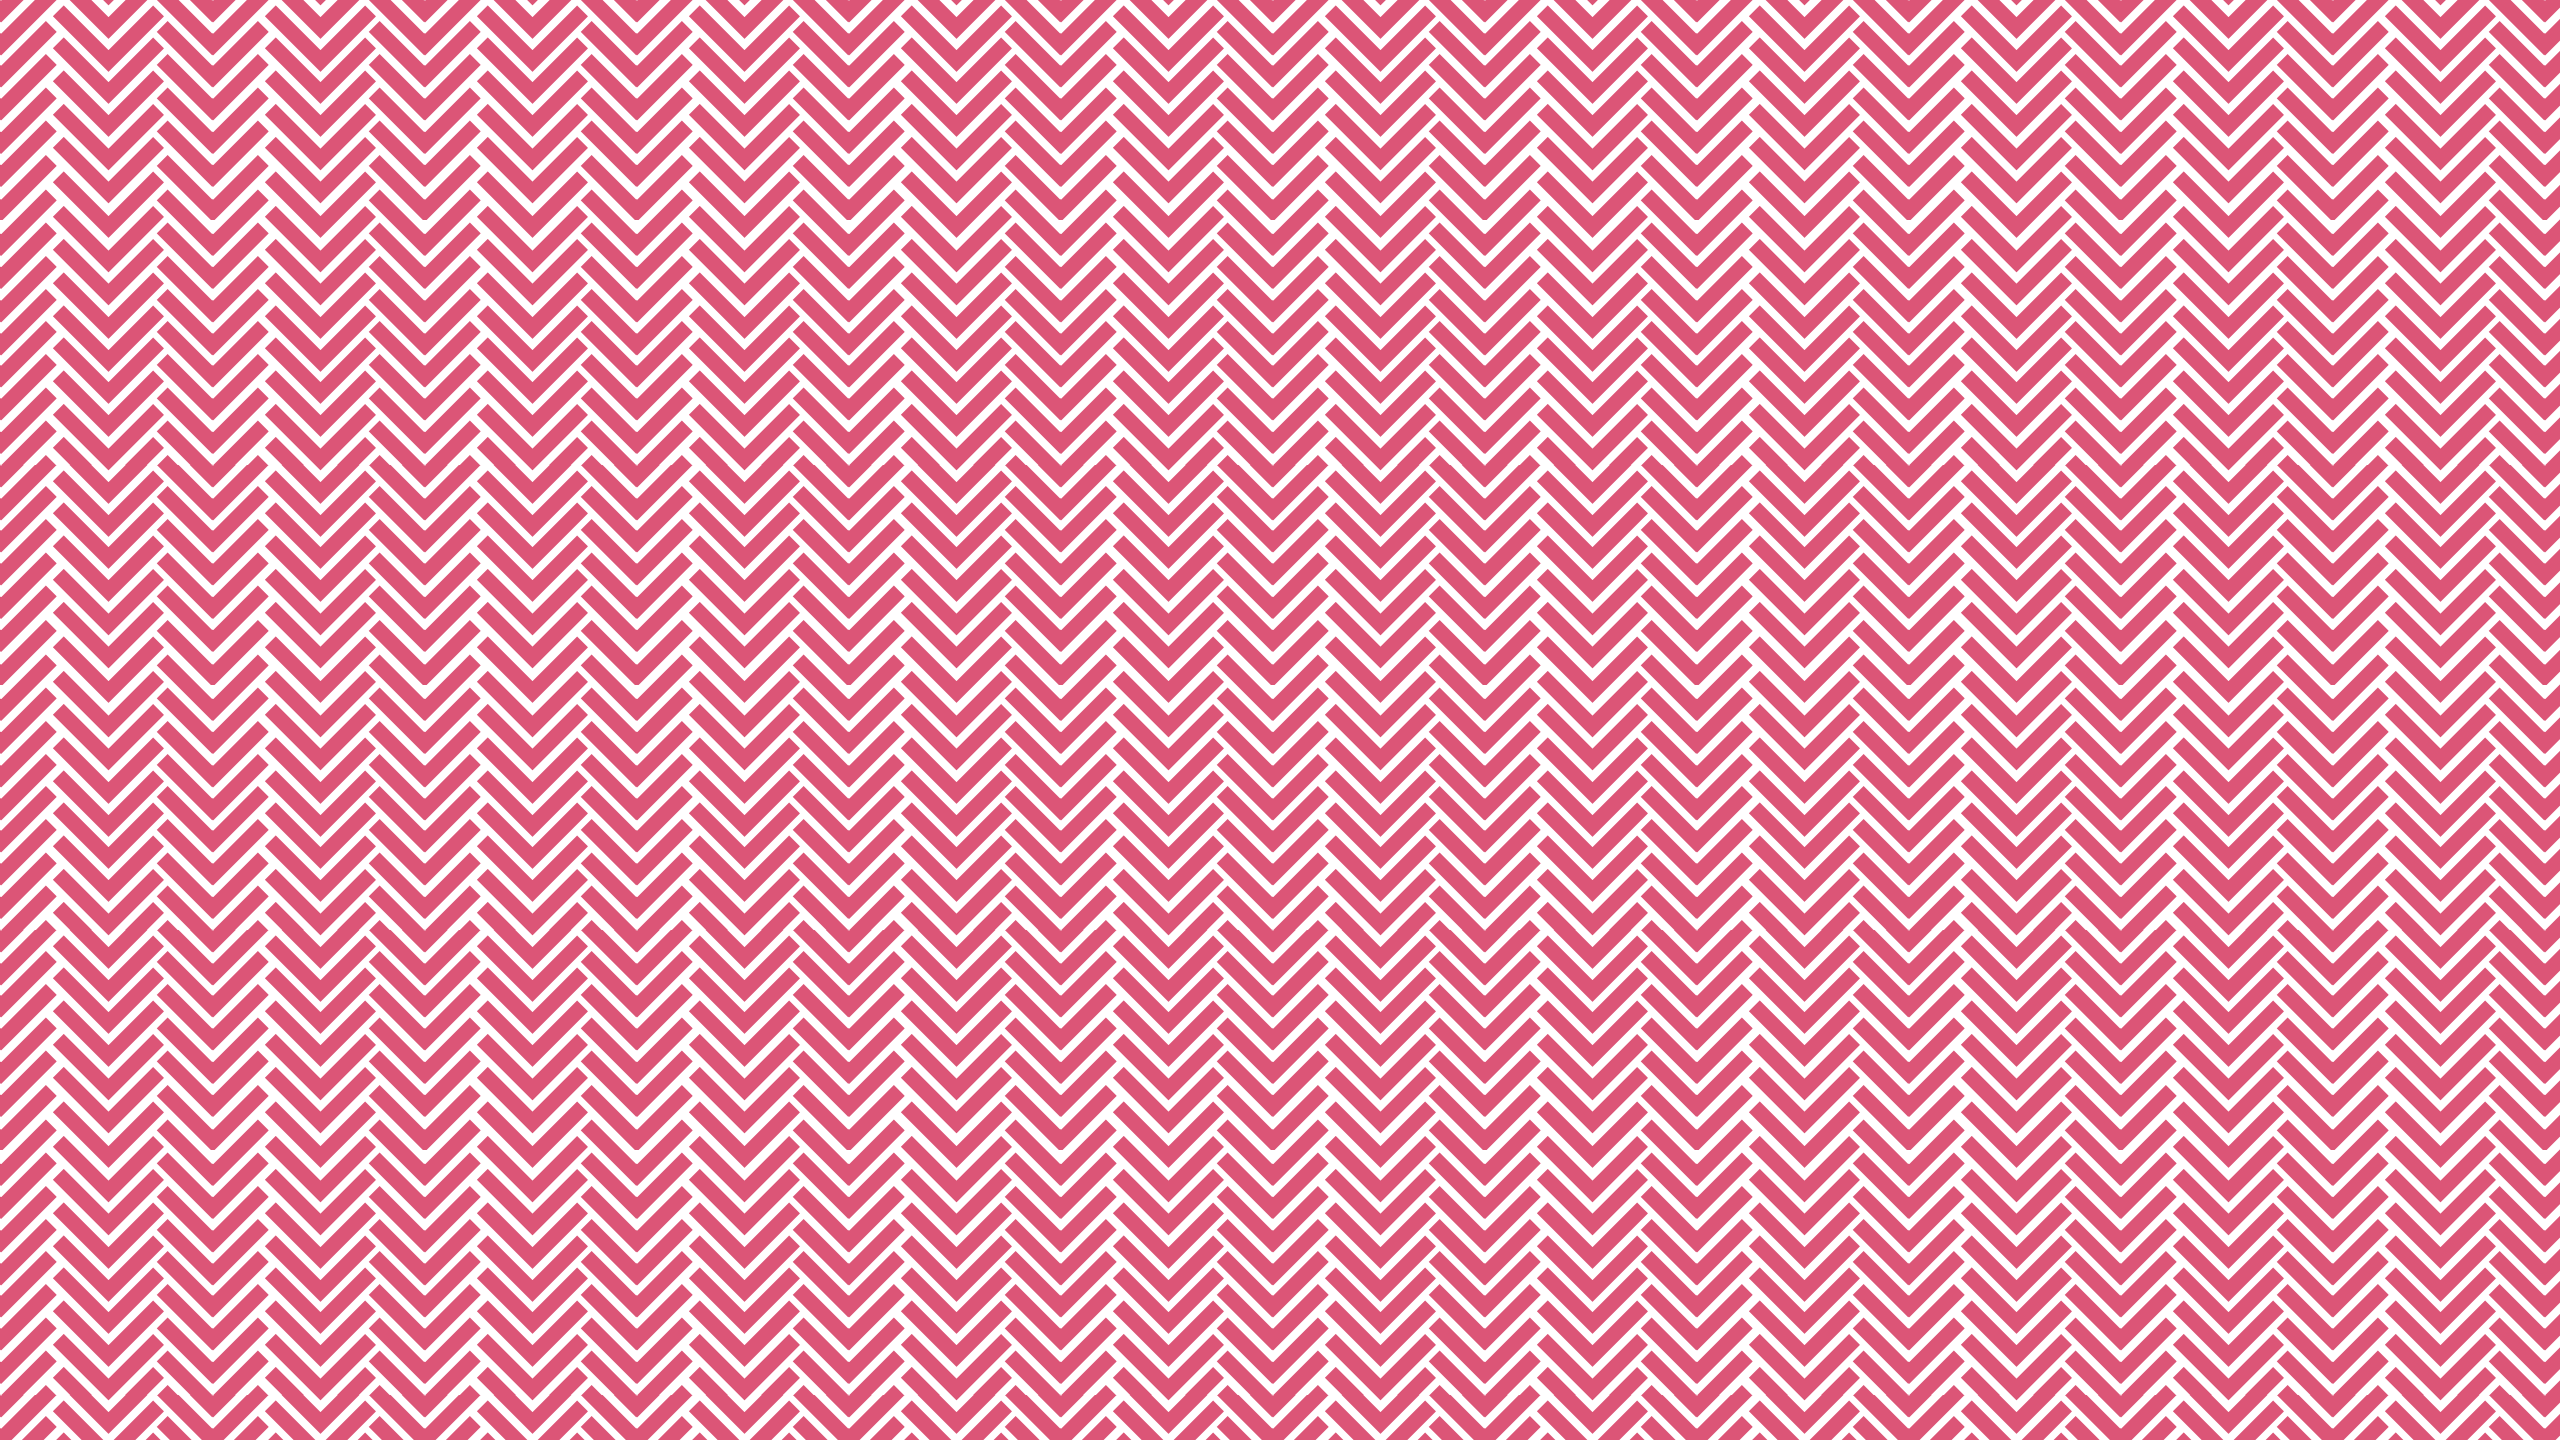 arrows desktop wallpaper installing this arrows desktop wallpaper is 2560x1440